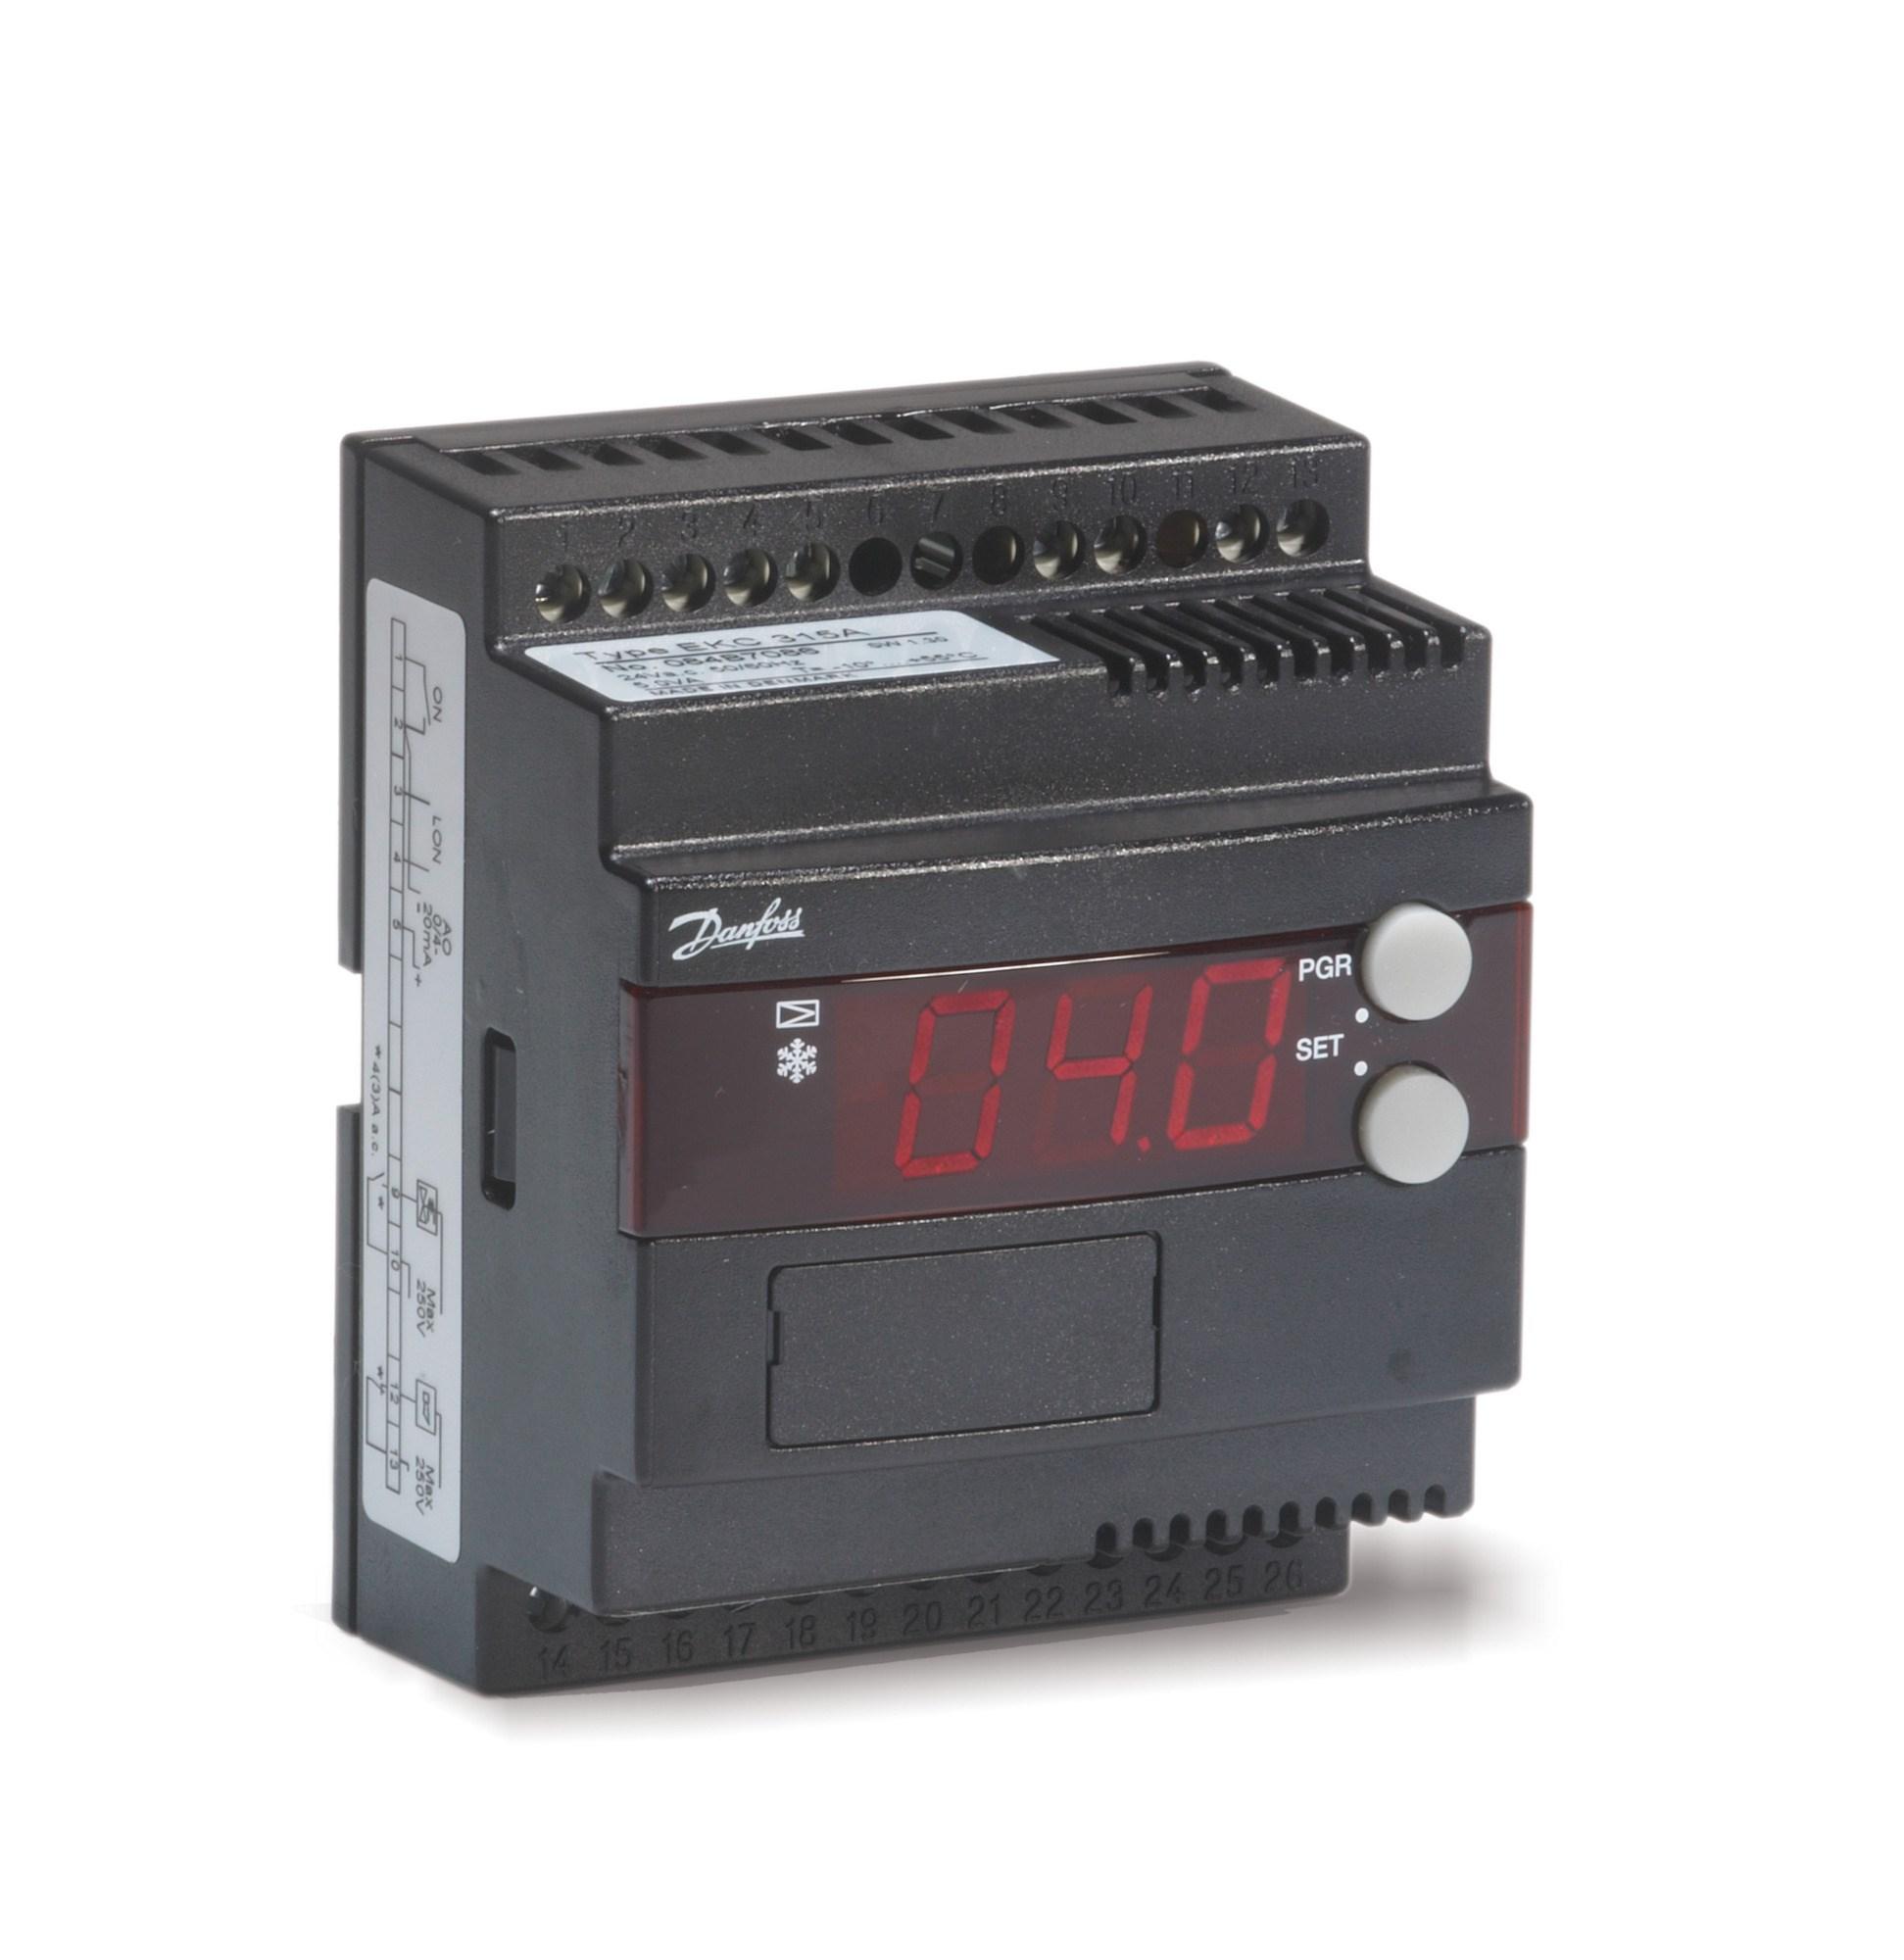 1 NEW Danfoss electronic expansion valve controller Type EKC 312 084B7250